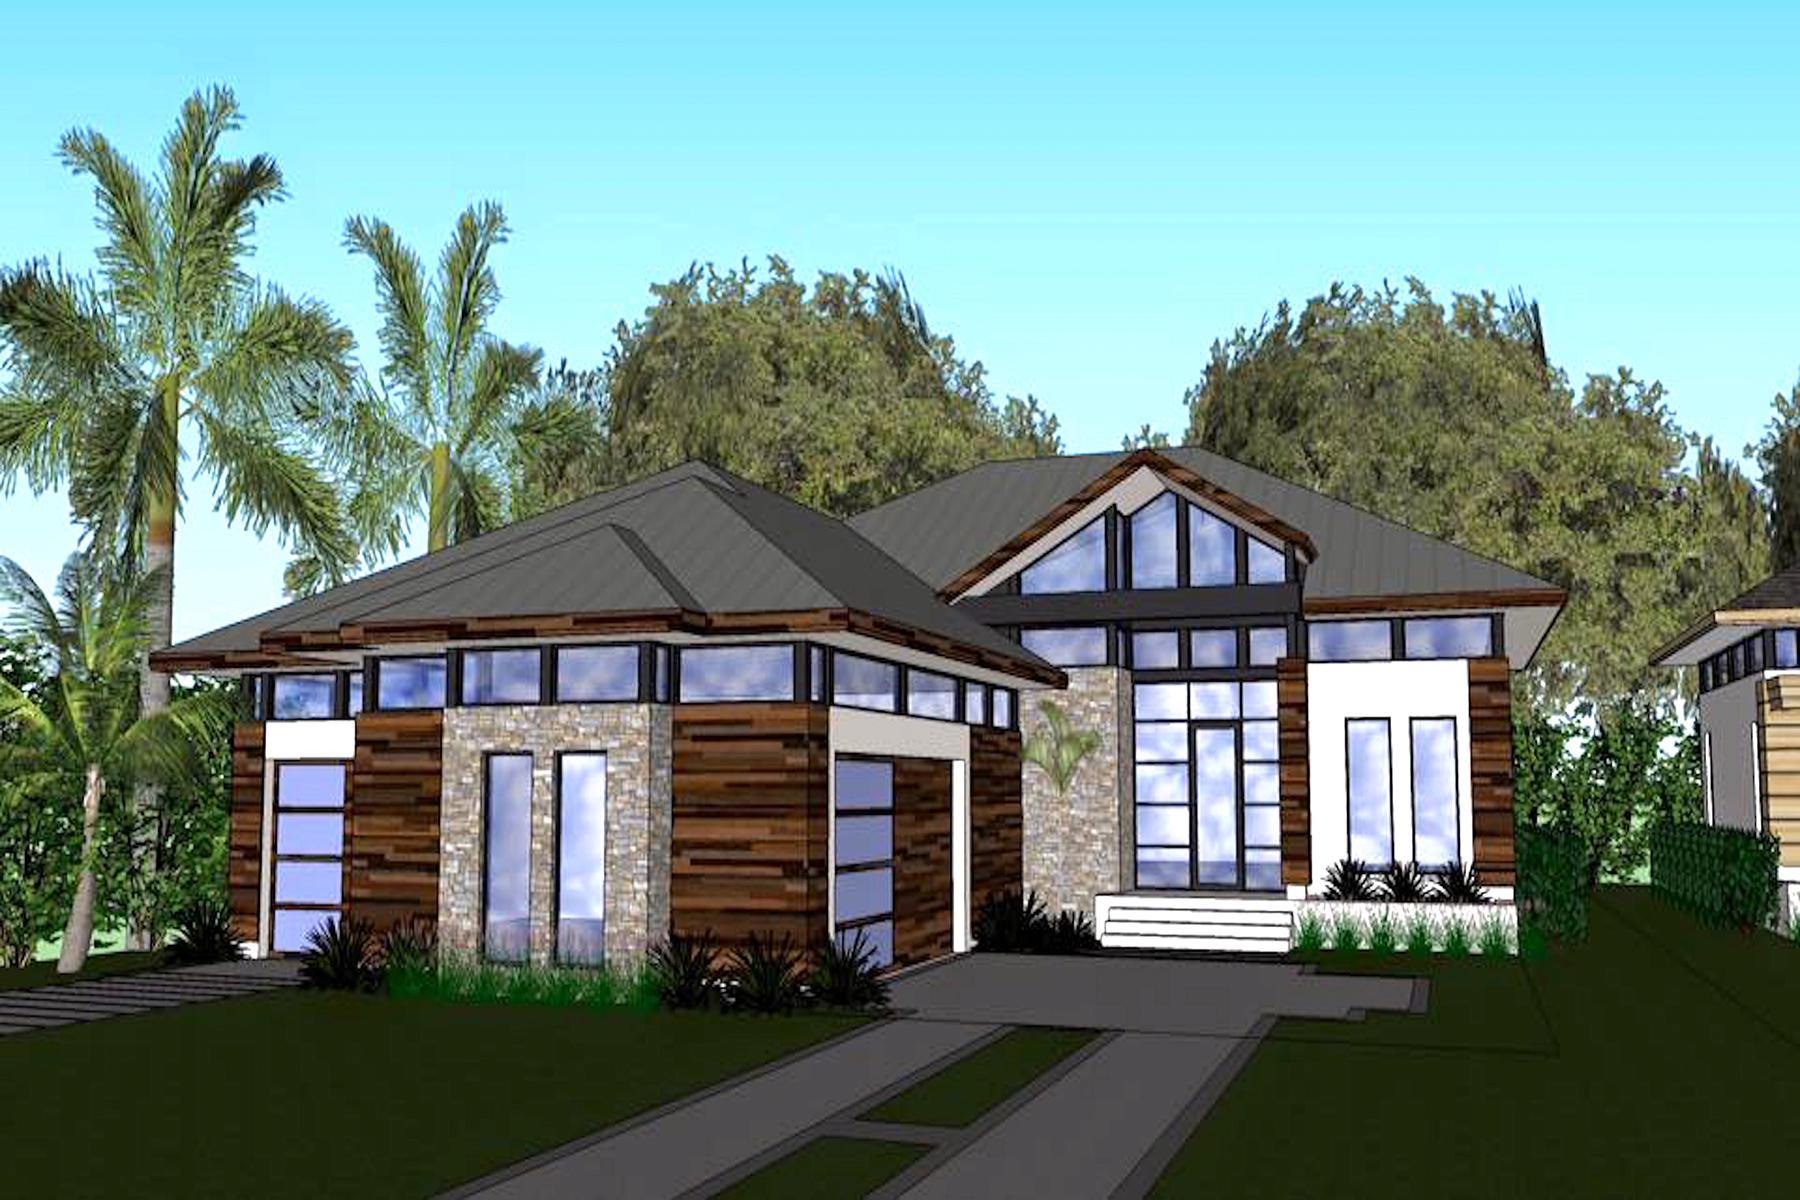 Single Family Home for Sale at LEGACY ESTATES 598 Lakeland Ave Lot 13 Naples, Florida, 34110 United States